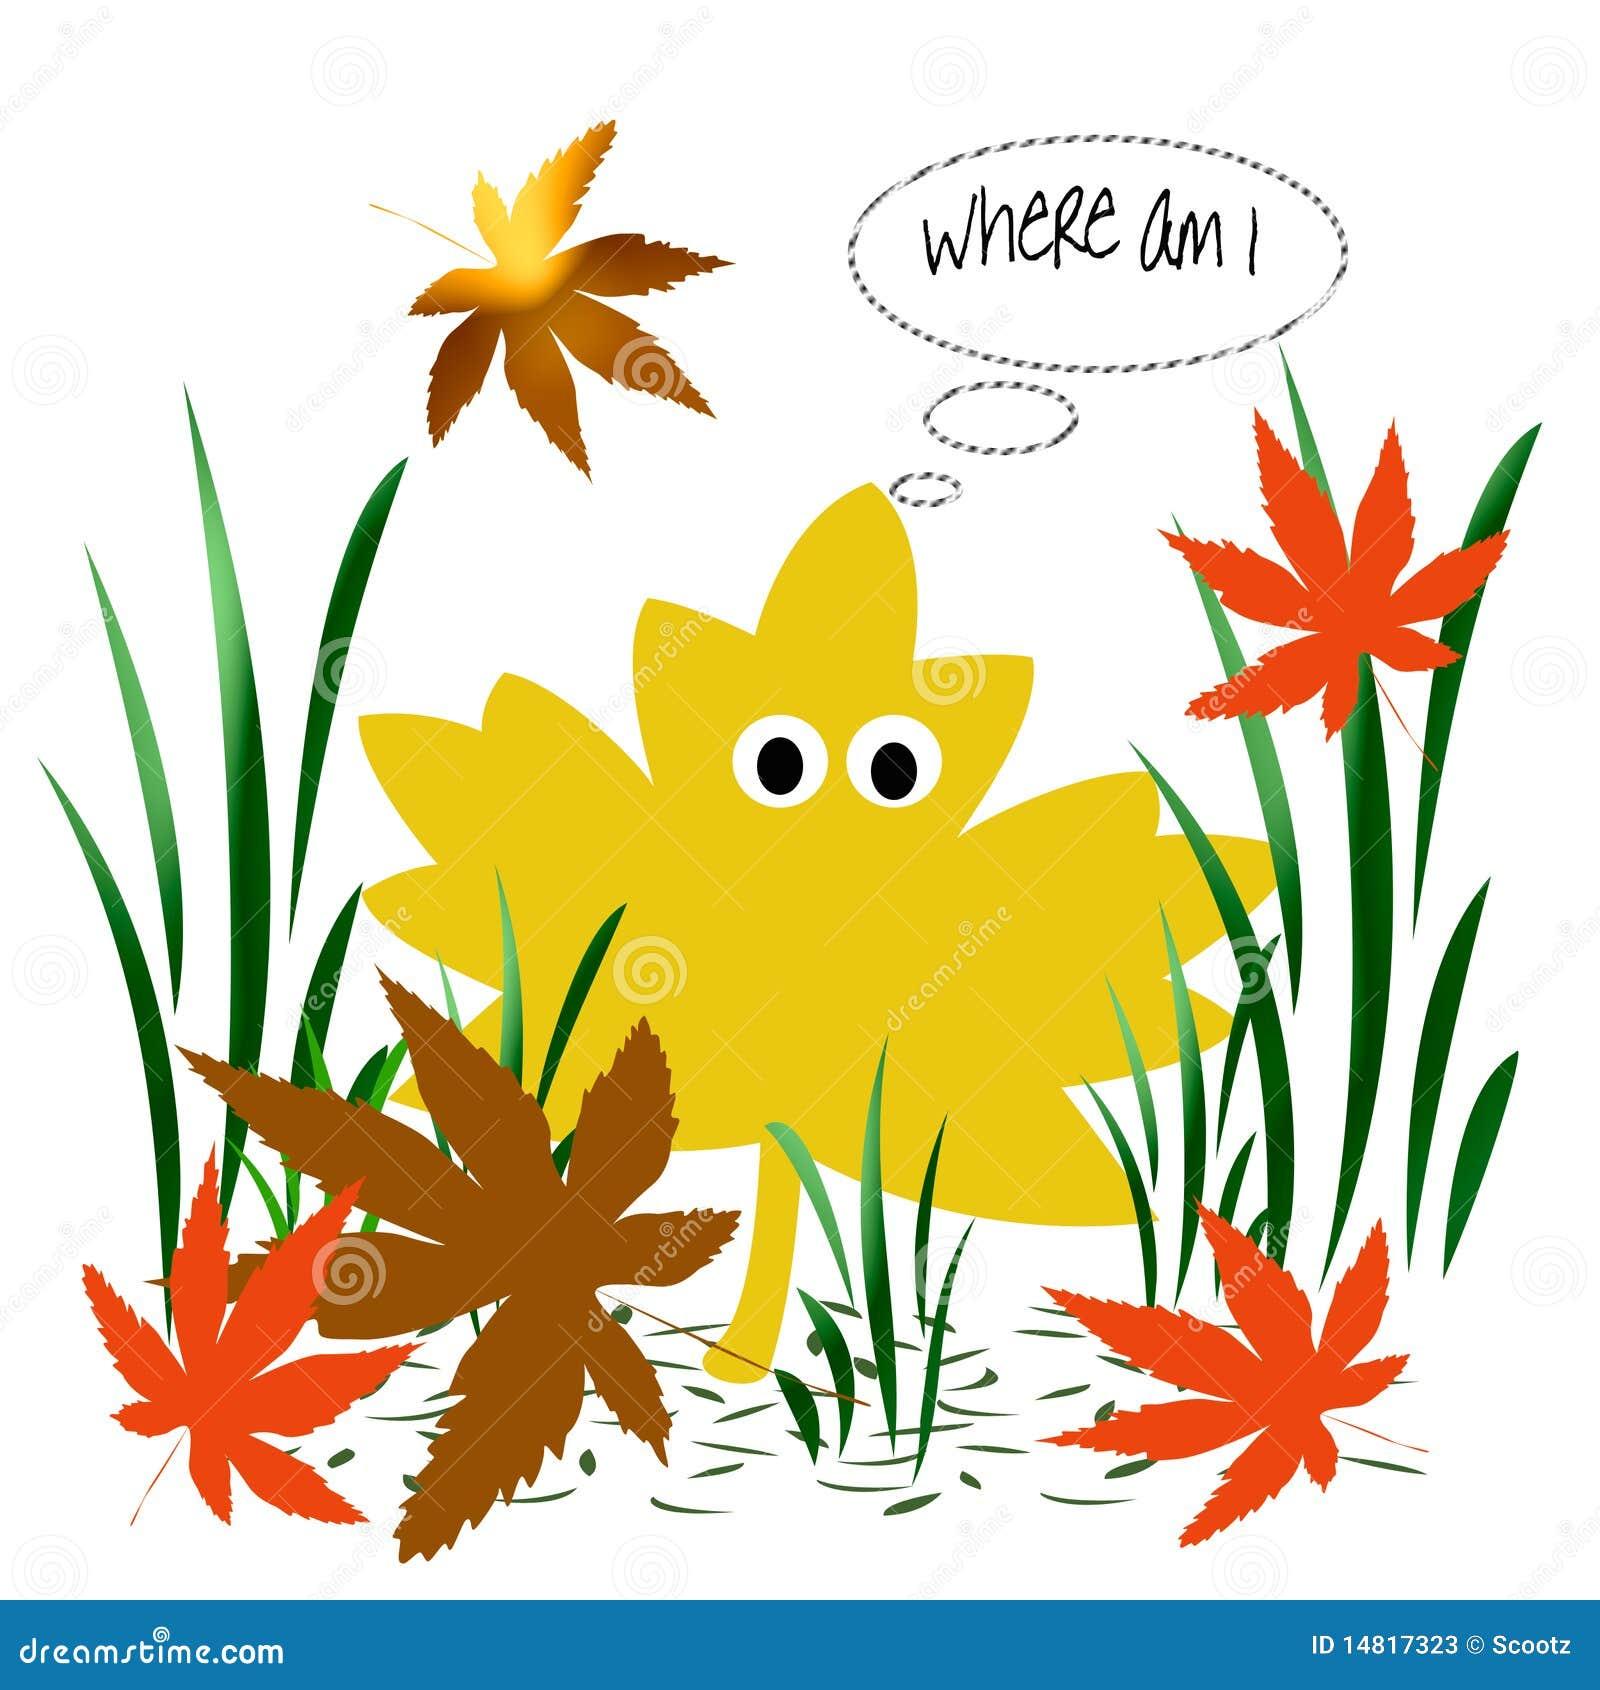 Leaf confusion